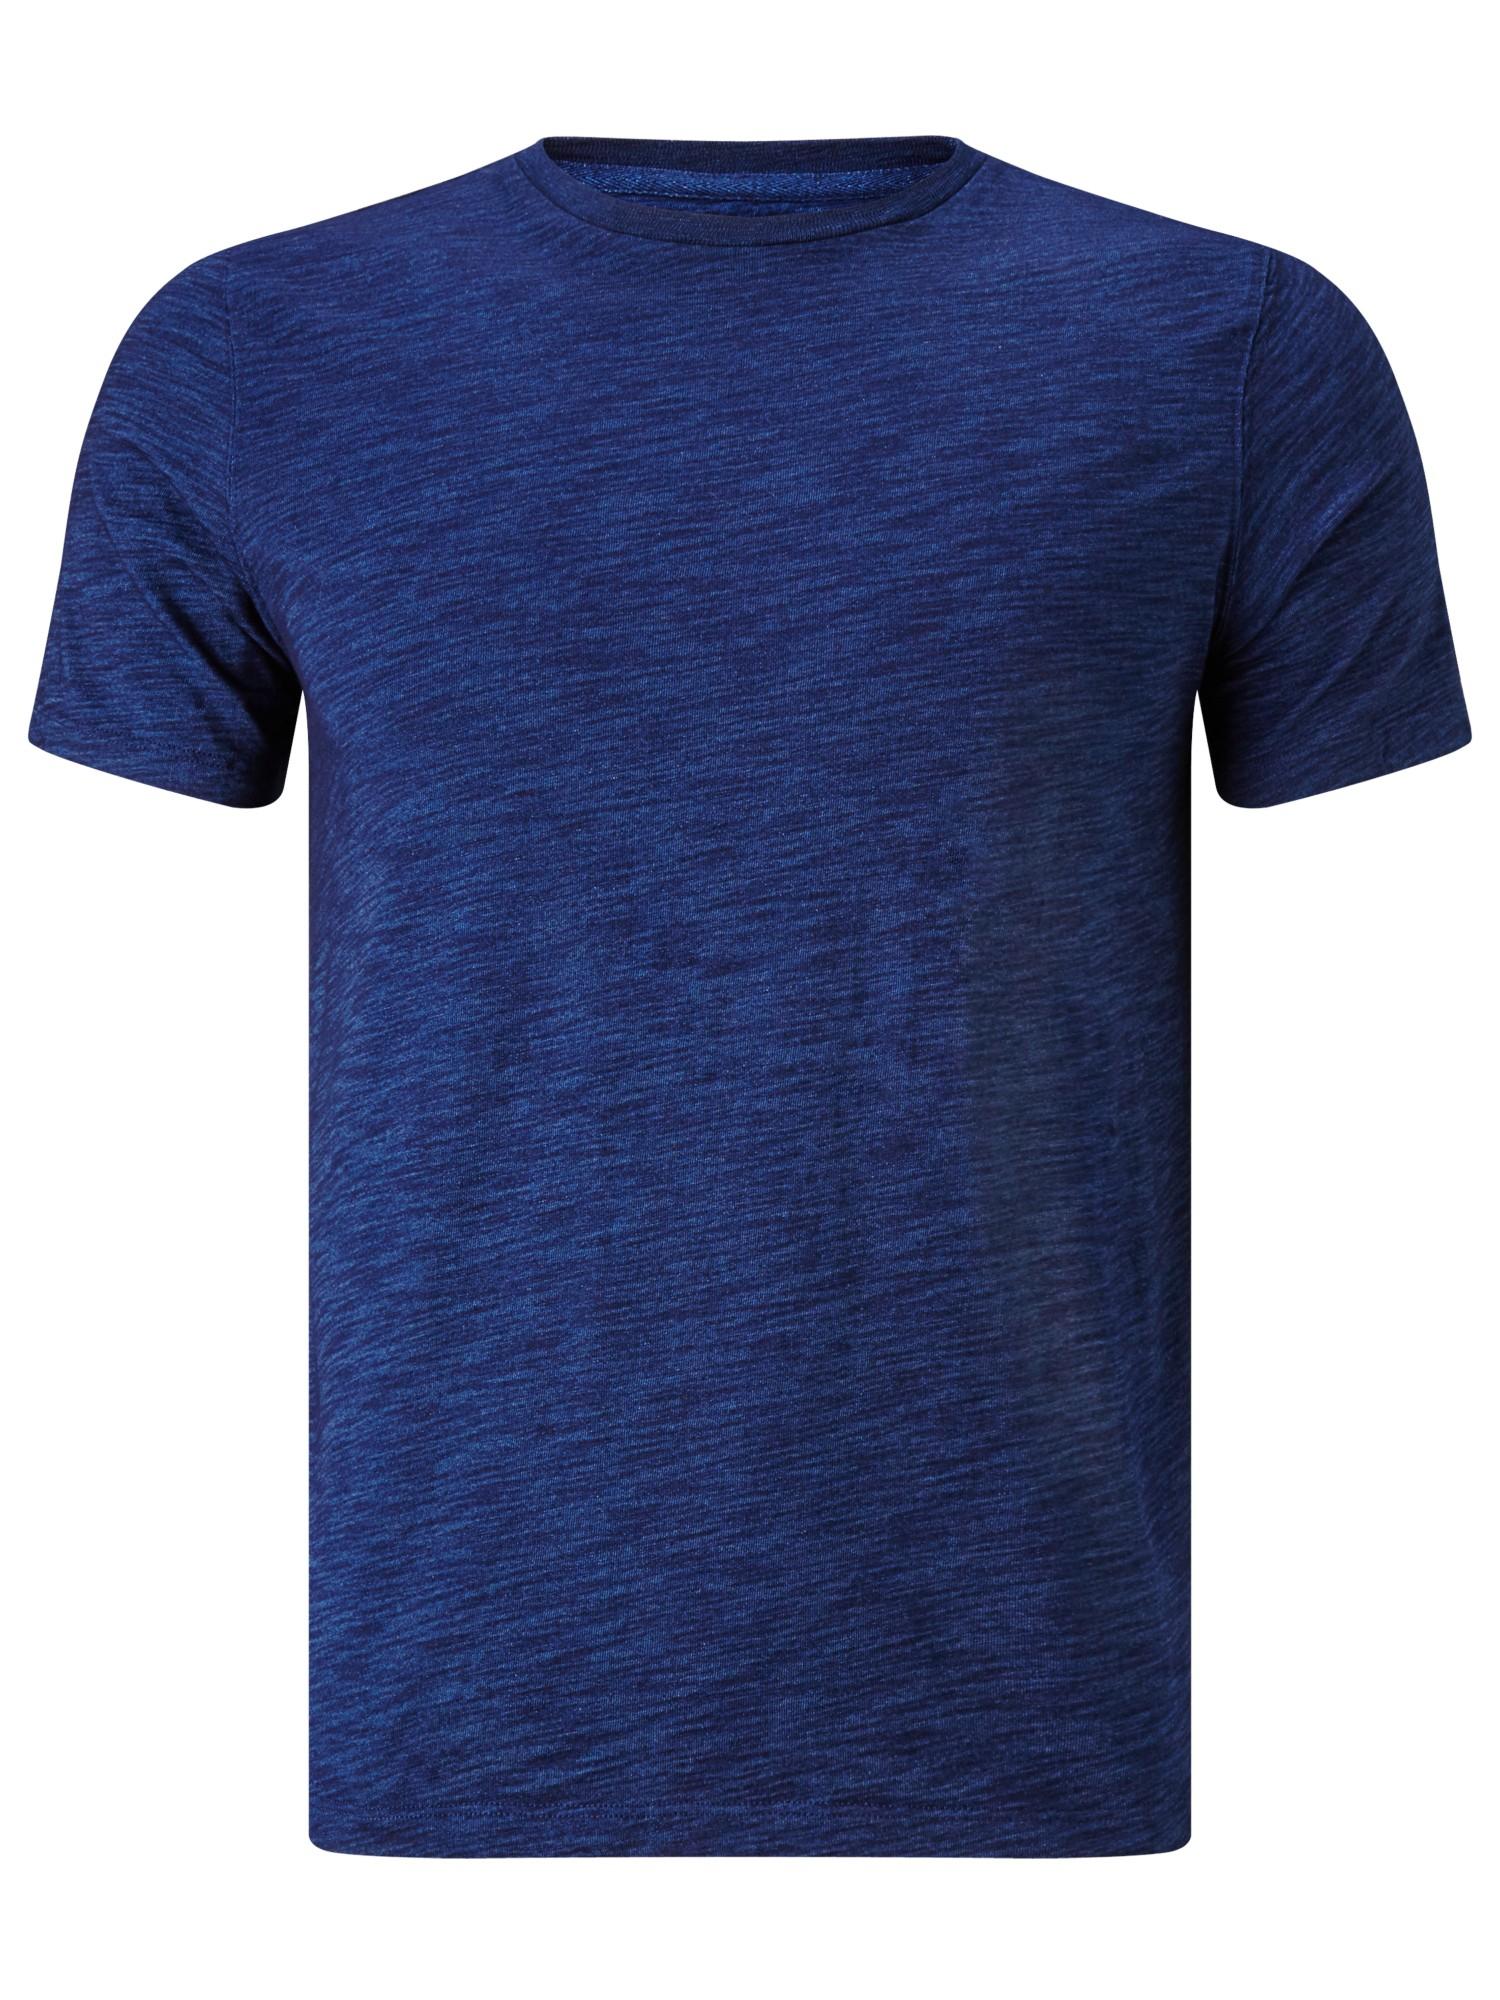 John lewis slub cotton crew neck t shirt in blue for men for What is a slub shirt